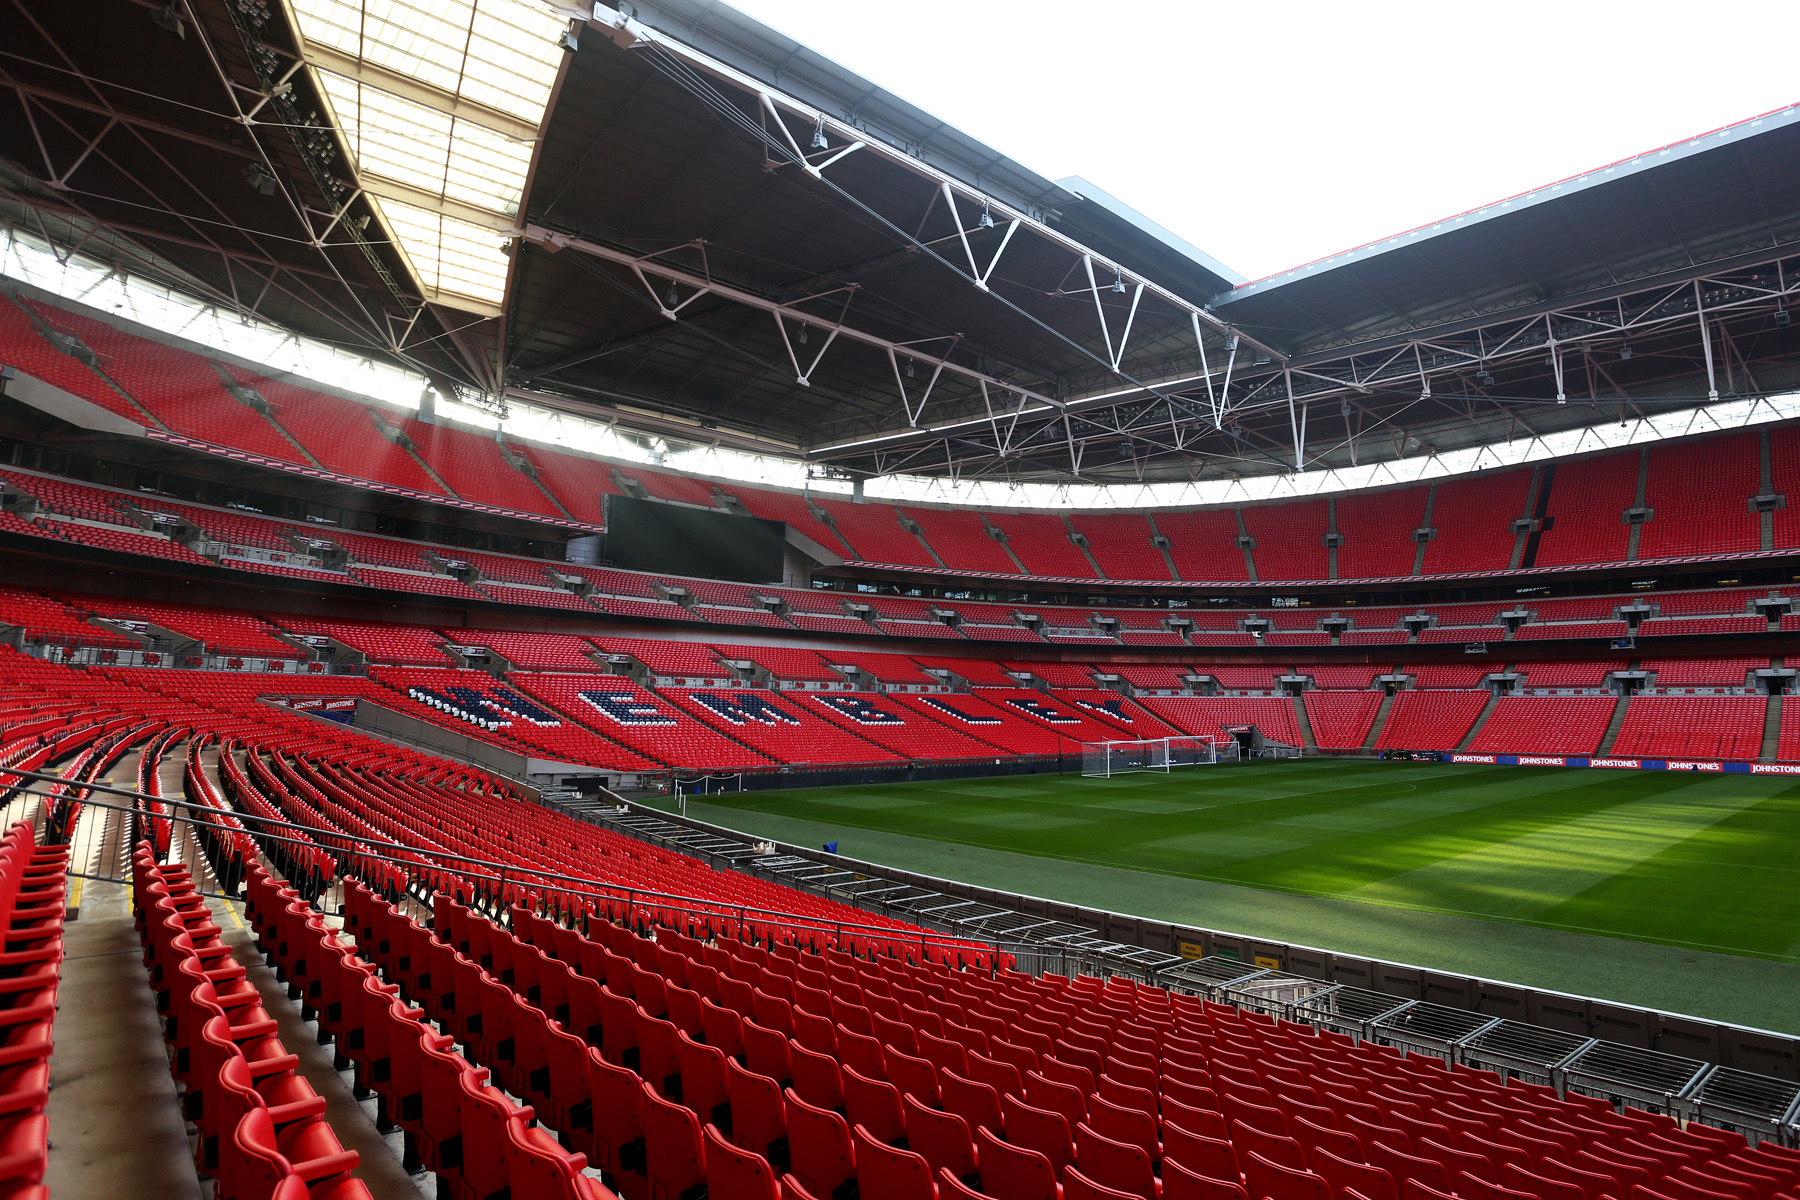 PR_Wembley4.jpg